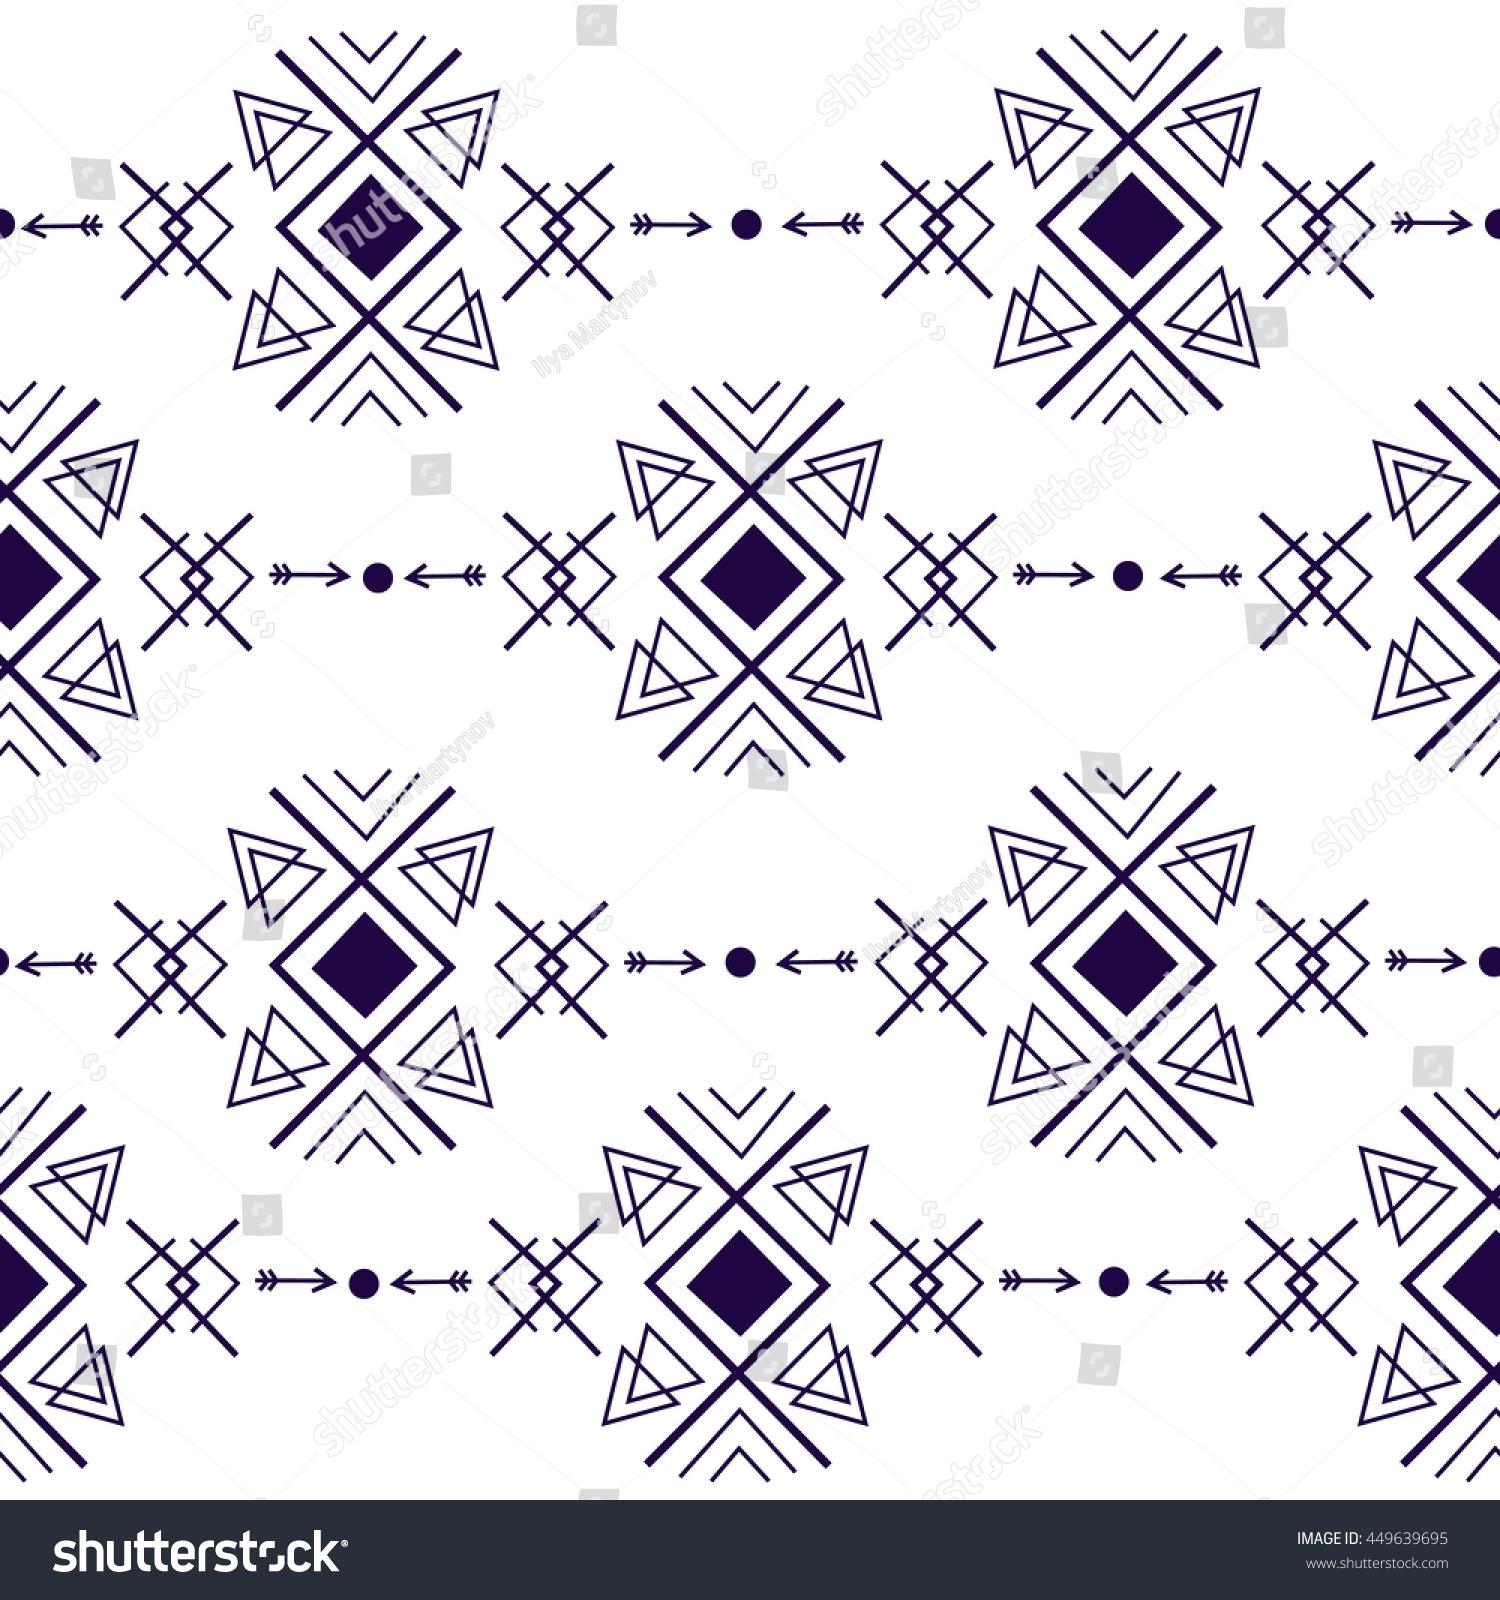 Seamless pattern signs sacred geometry alchemy stock vector seamless pattern signs sacred geometry alchemy religion philosophy spirituality hipster symbols biocorpaavc